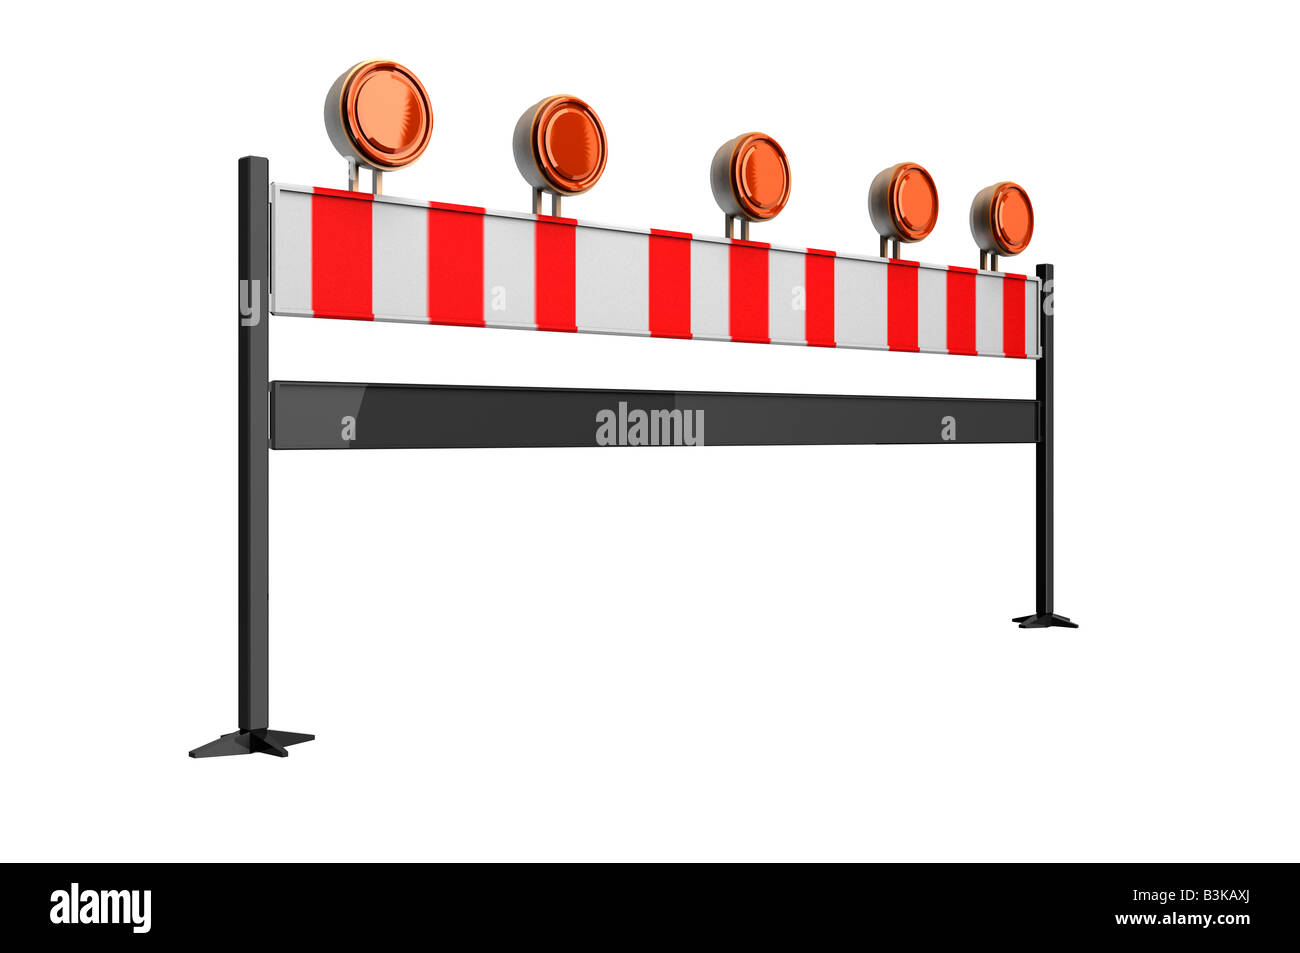 Traffic barrier roadblock barricade - Stock Image